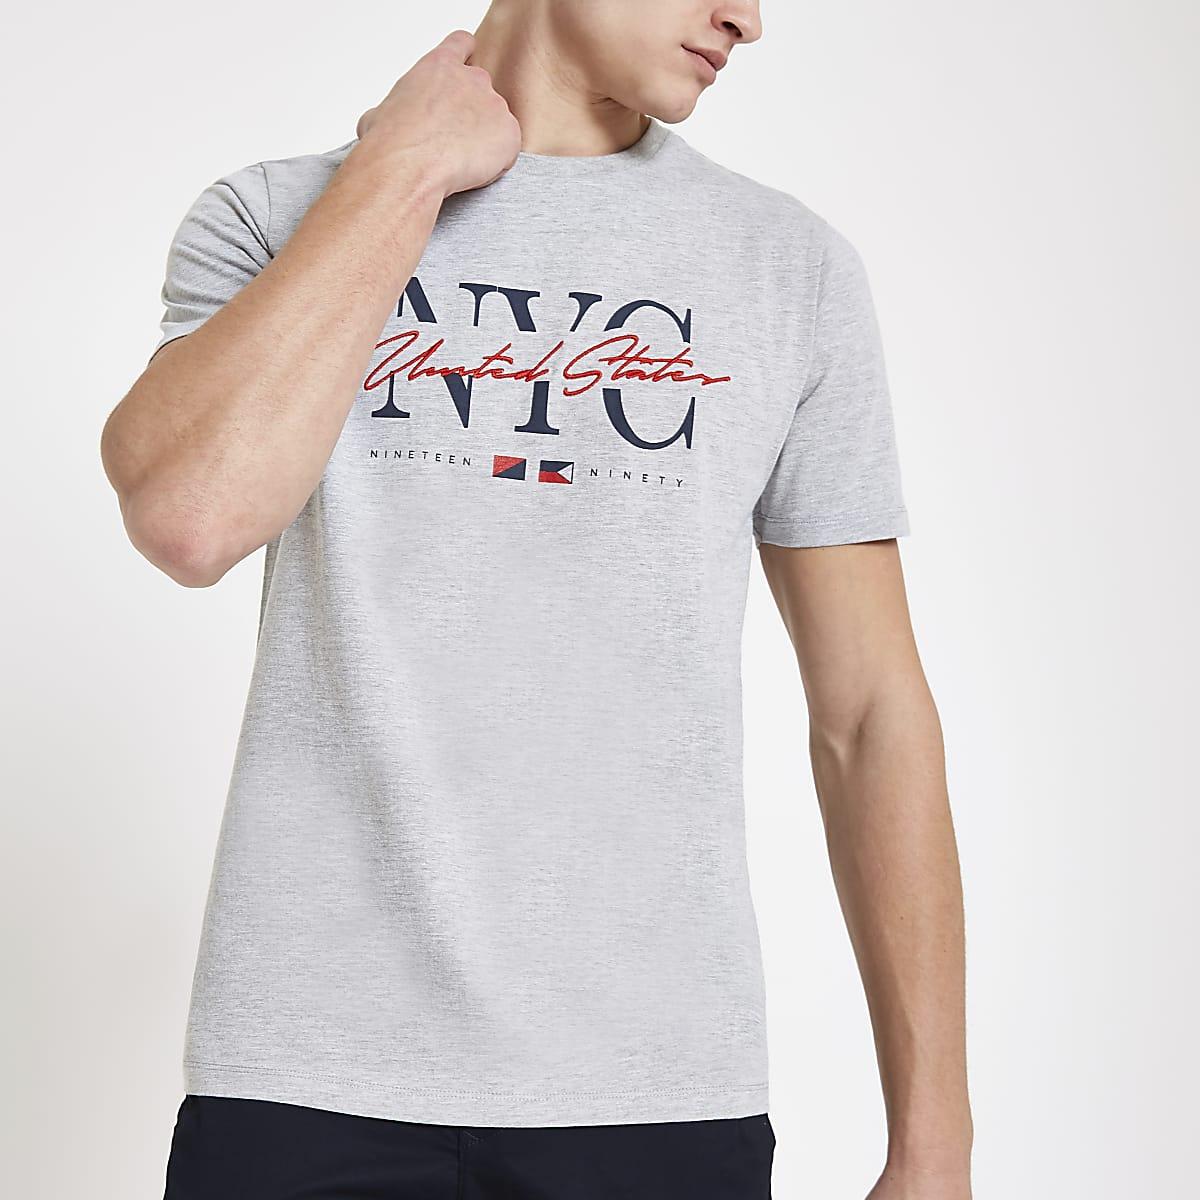 2f1ffad79 Grey 'NYC' slim fit T-shirt - T-shirts - T-Shirts & Vests - men